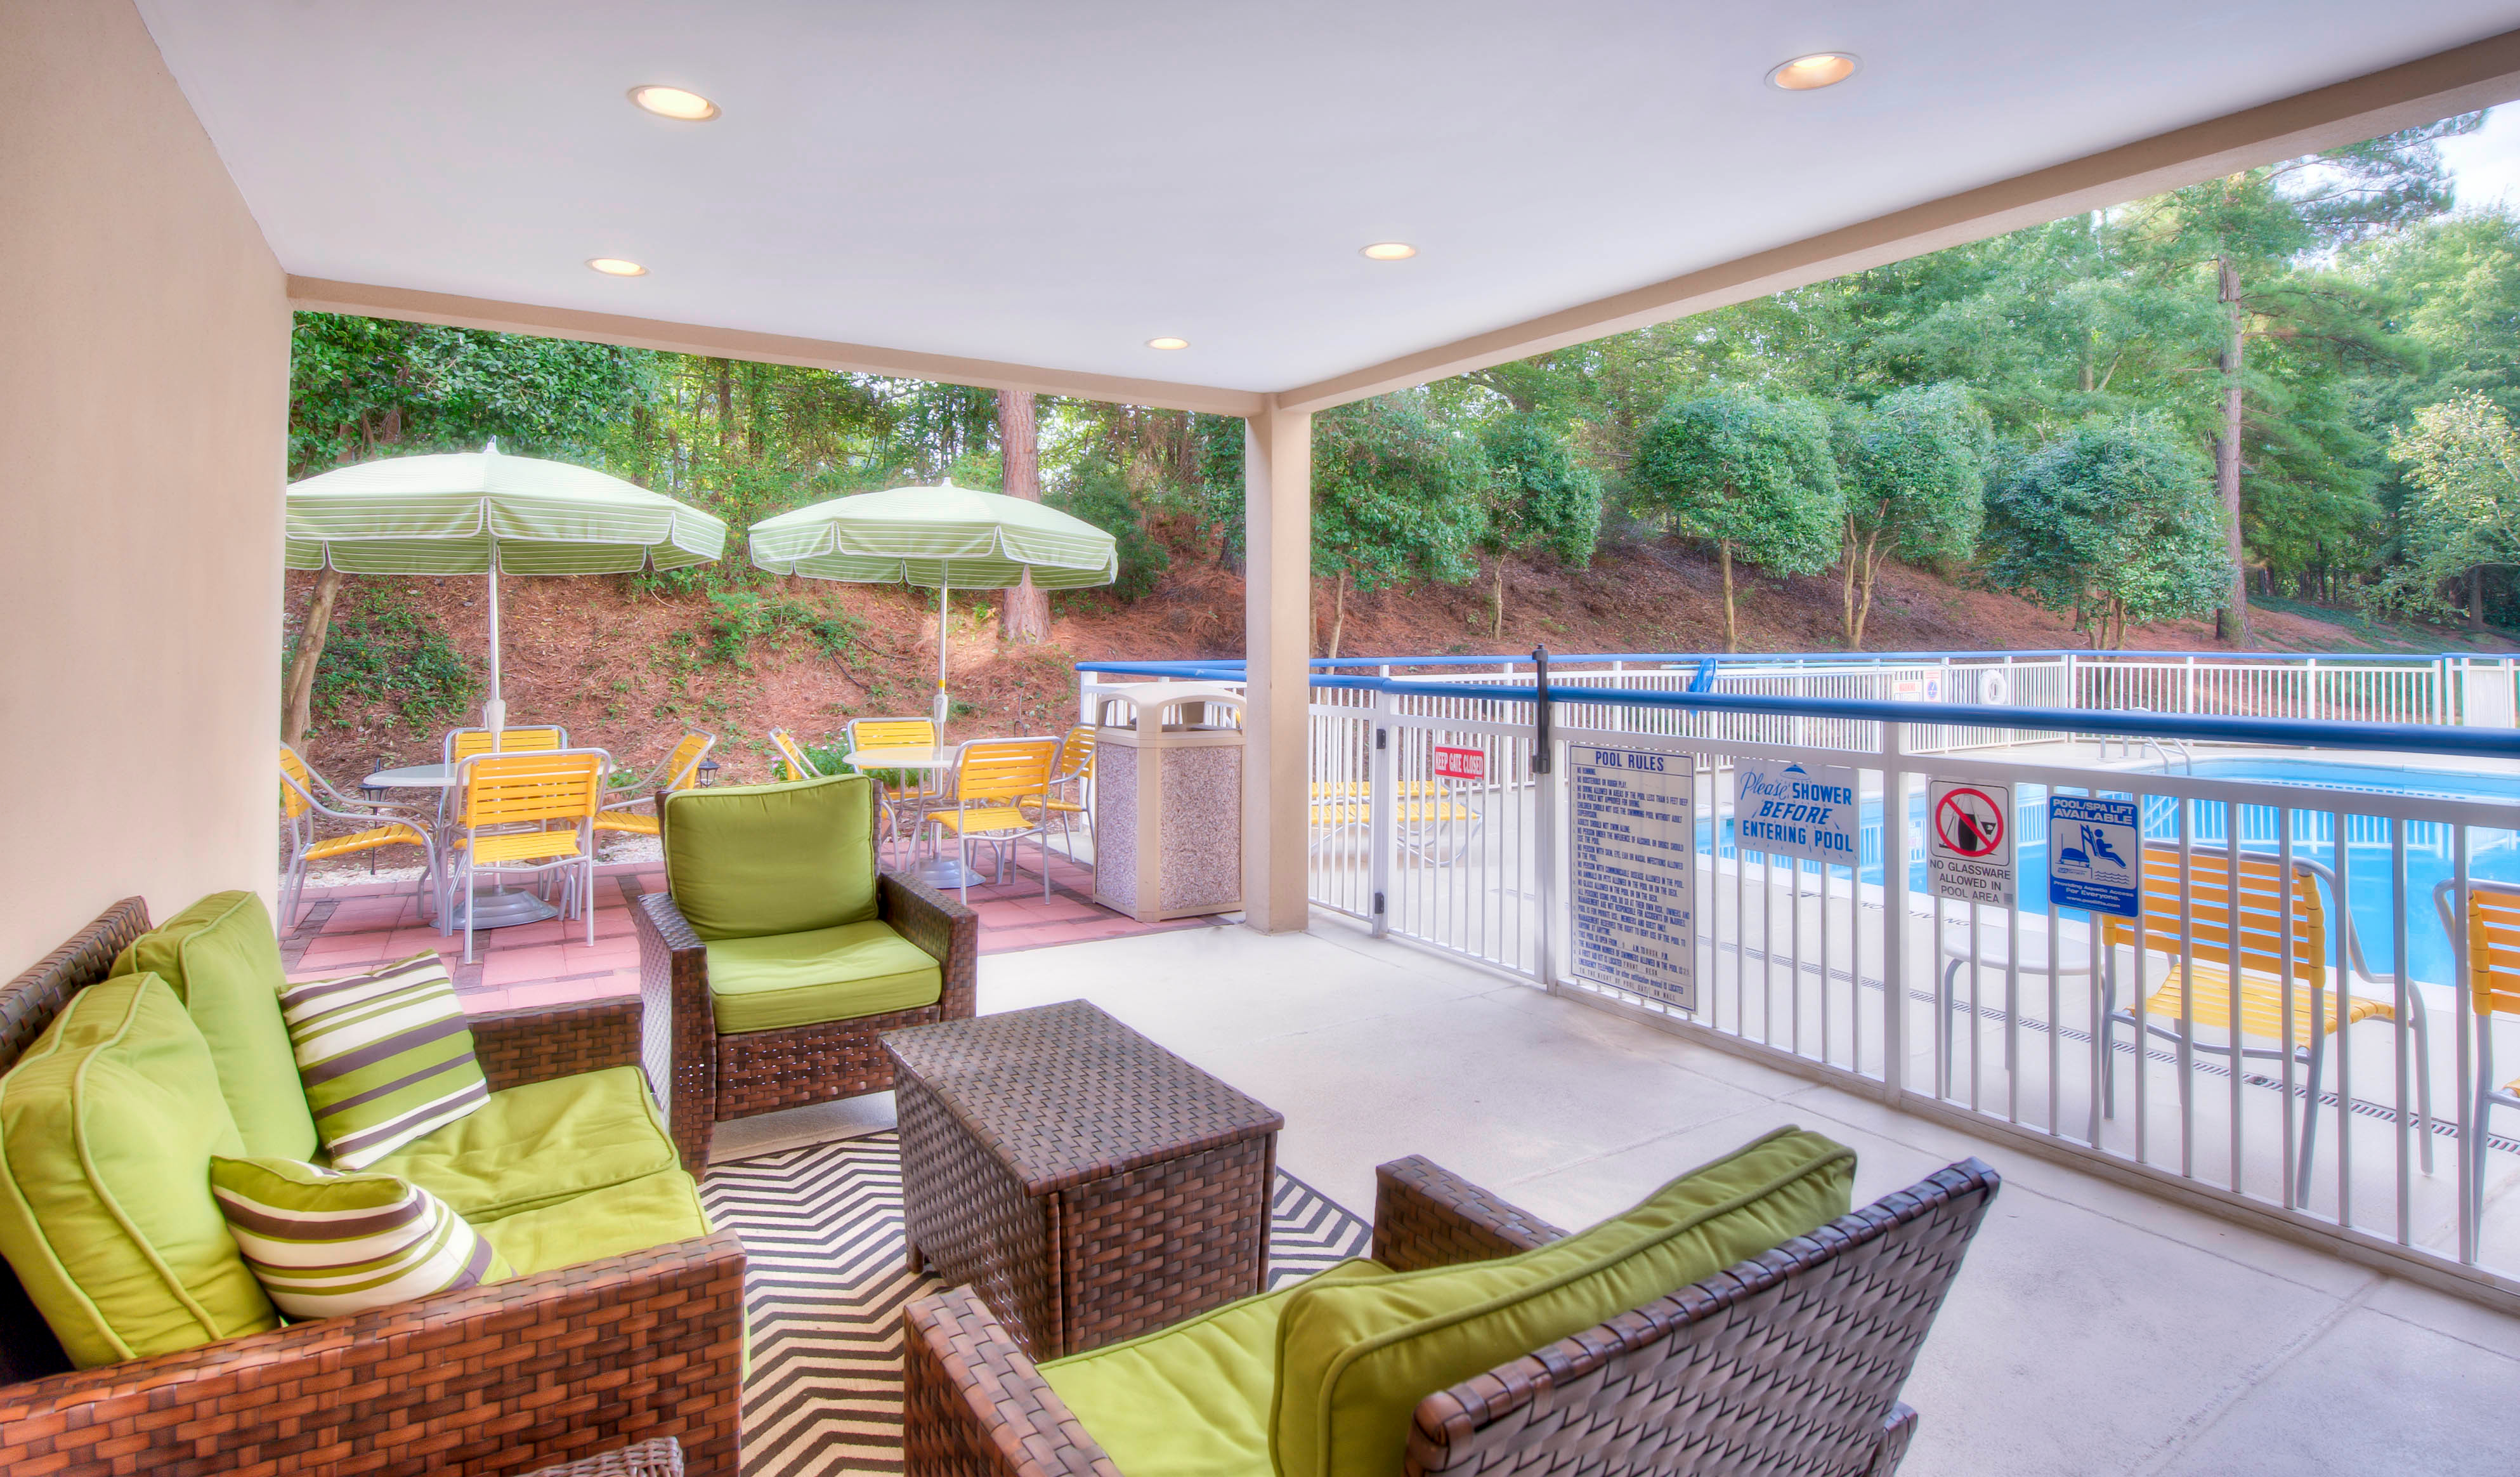 Fairfield Inn Suites By Marriott Raleigh Crabtree Valley Raleigh North Carolina Nc